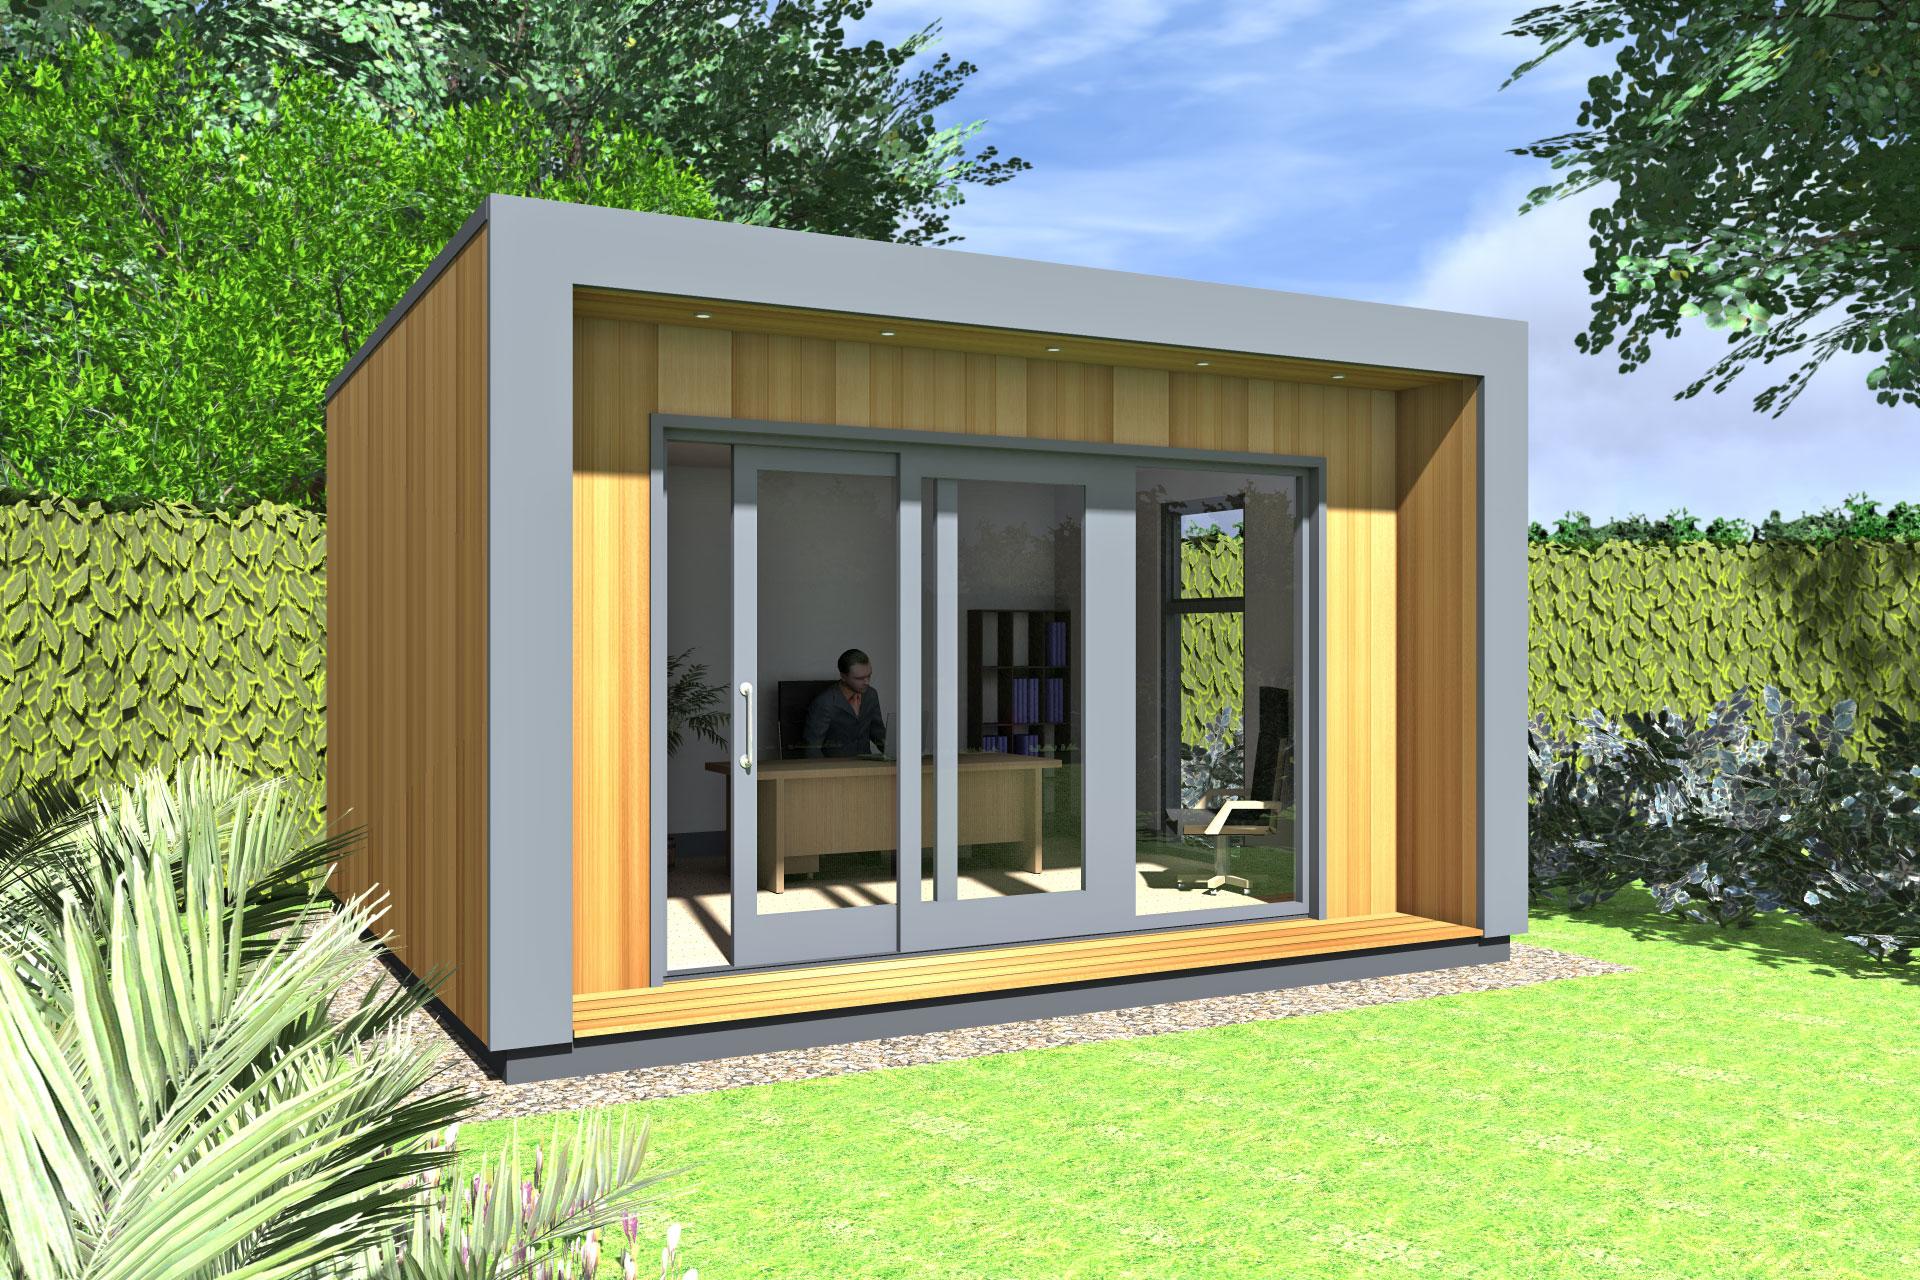 Office Pods Ideas Gallery Garden Office Ideas Gallery ECOS Ireland